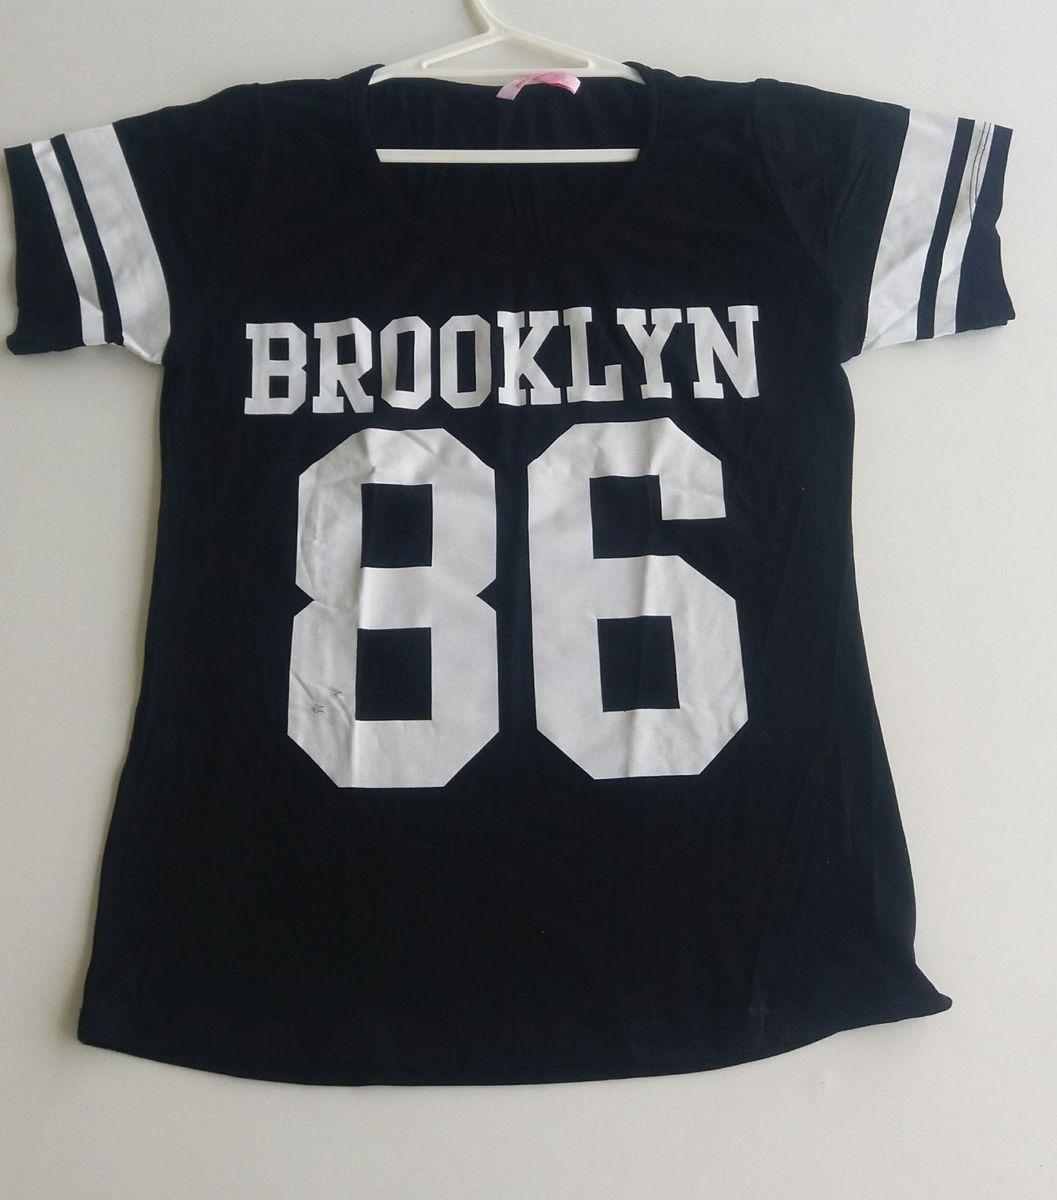 f68ad61ea camiseta brookyn 86 - camisetas little white tee.  Czm6ly9wag90b3muzw5qb2vplmnvbs5ici9wcm9kdwn0cy82ndg5odkxl2fkzgy3zdflytq1njk1njc0ywi3mzm2mzq0njiynzlhlmpwzw  ...